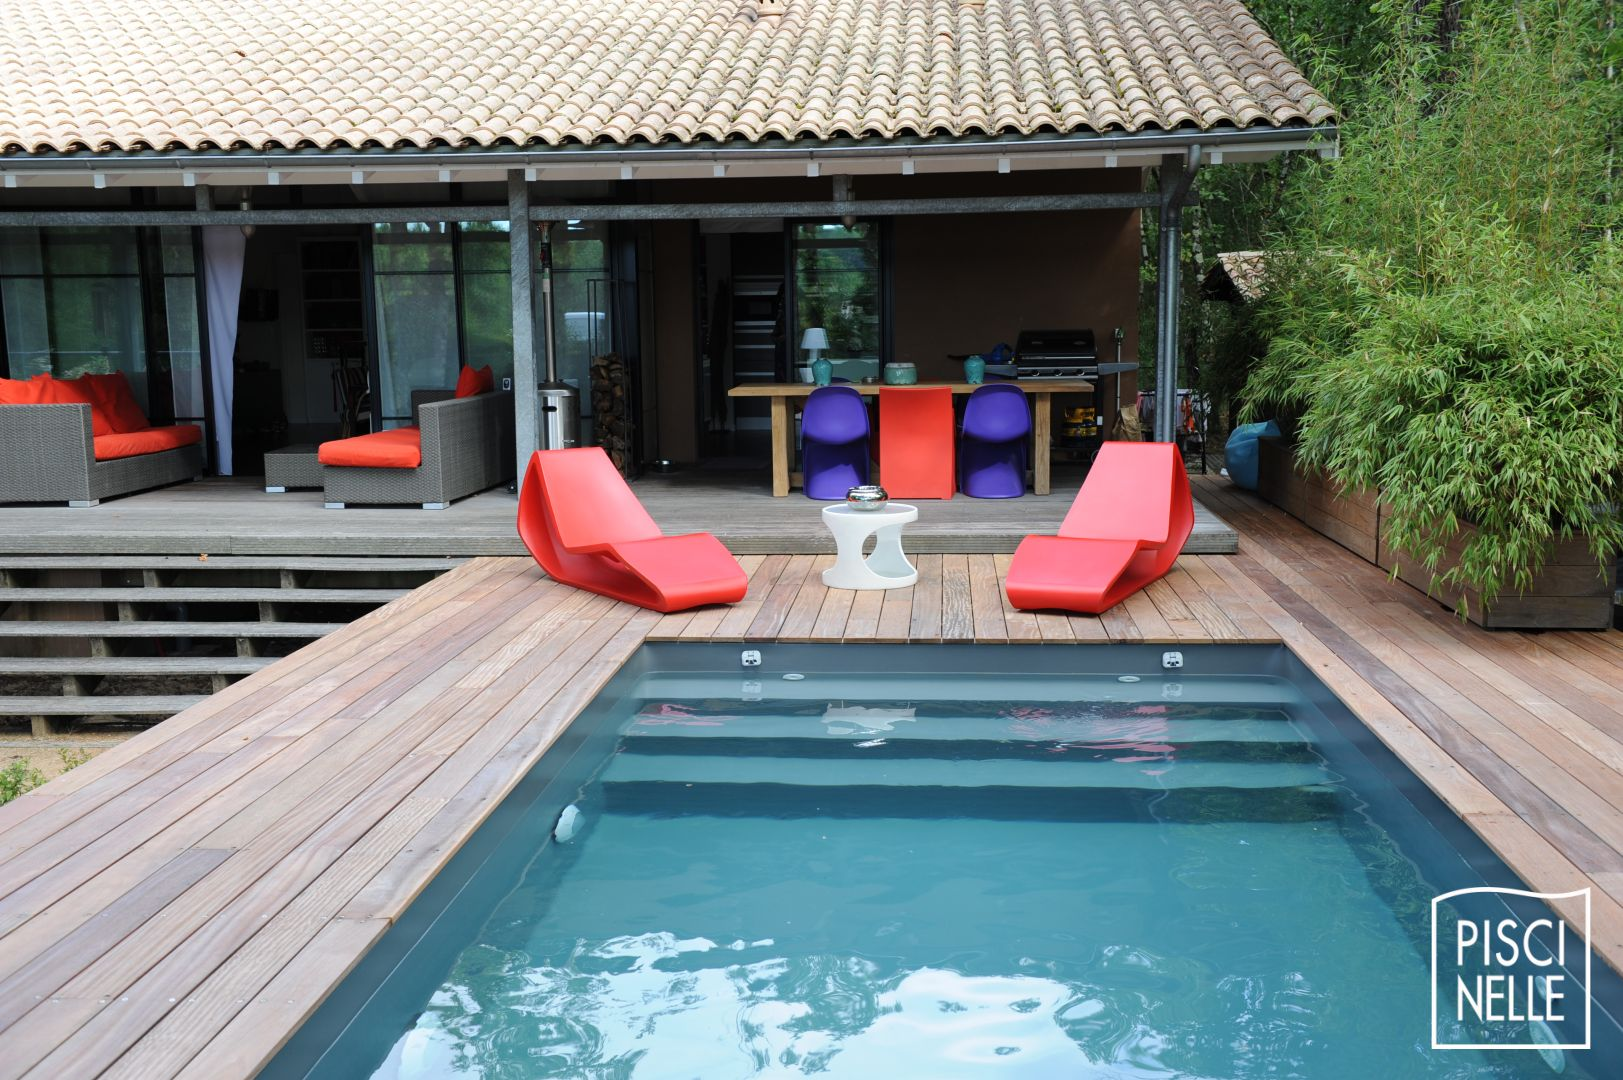 Piscine inox aquitaine for Constructeur piscine alsace